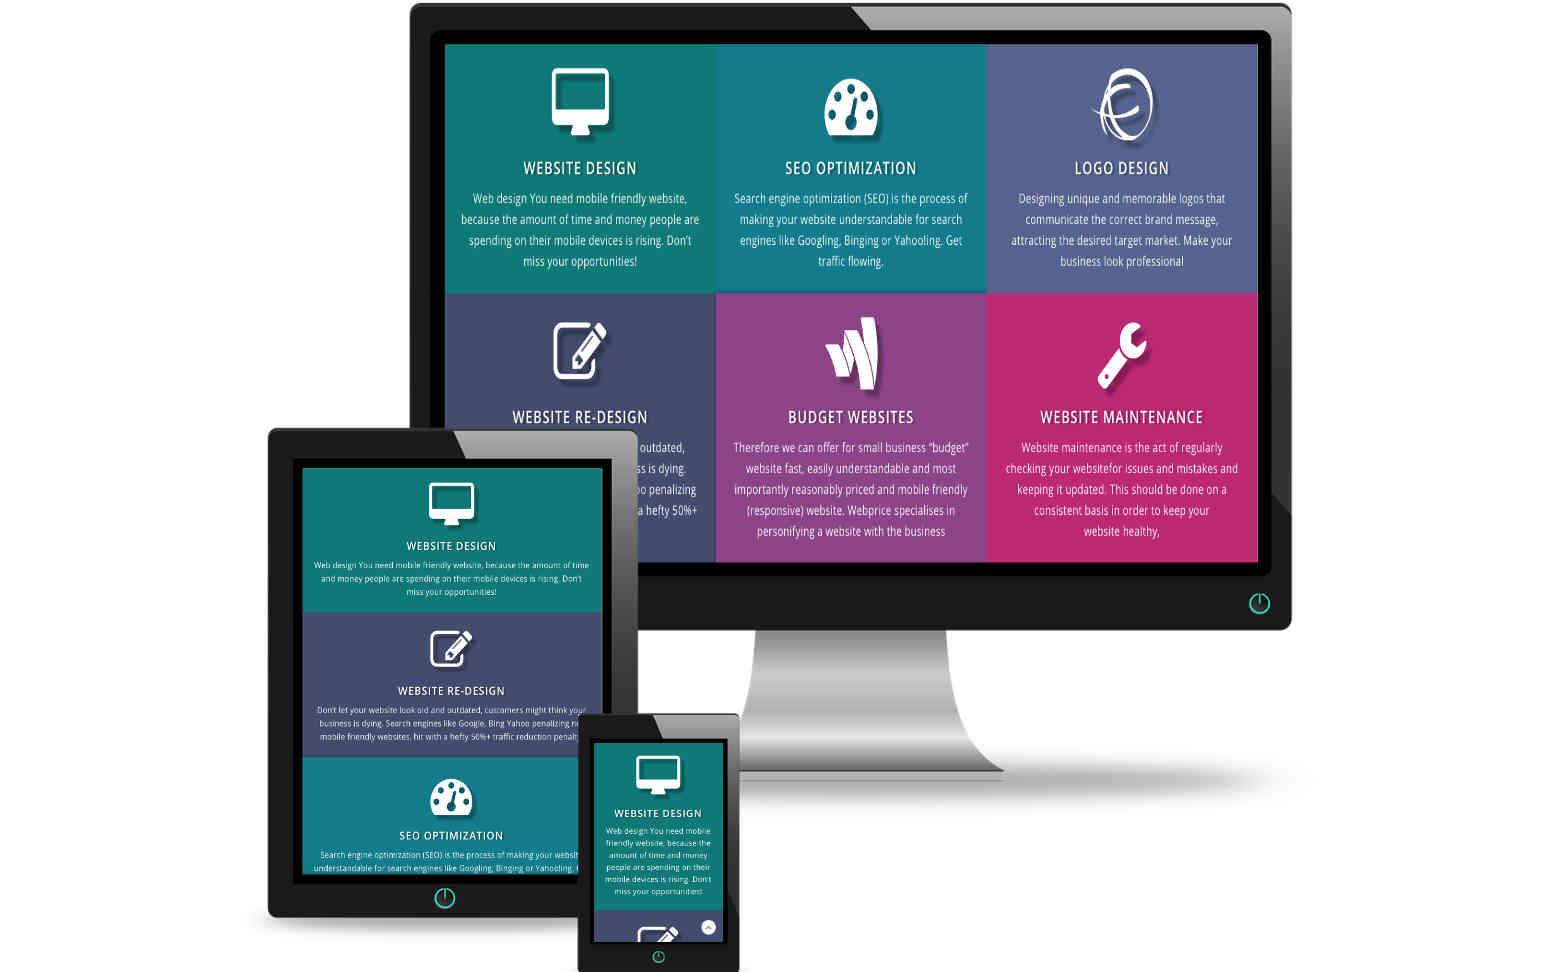 New websites design